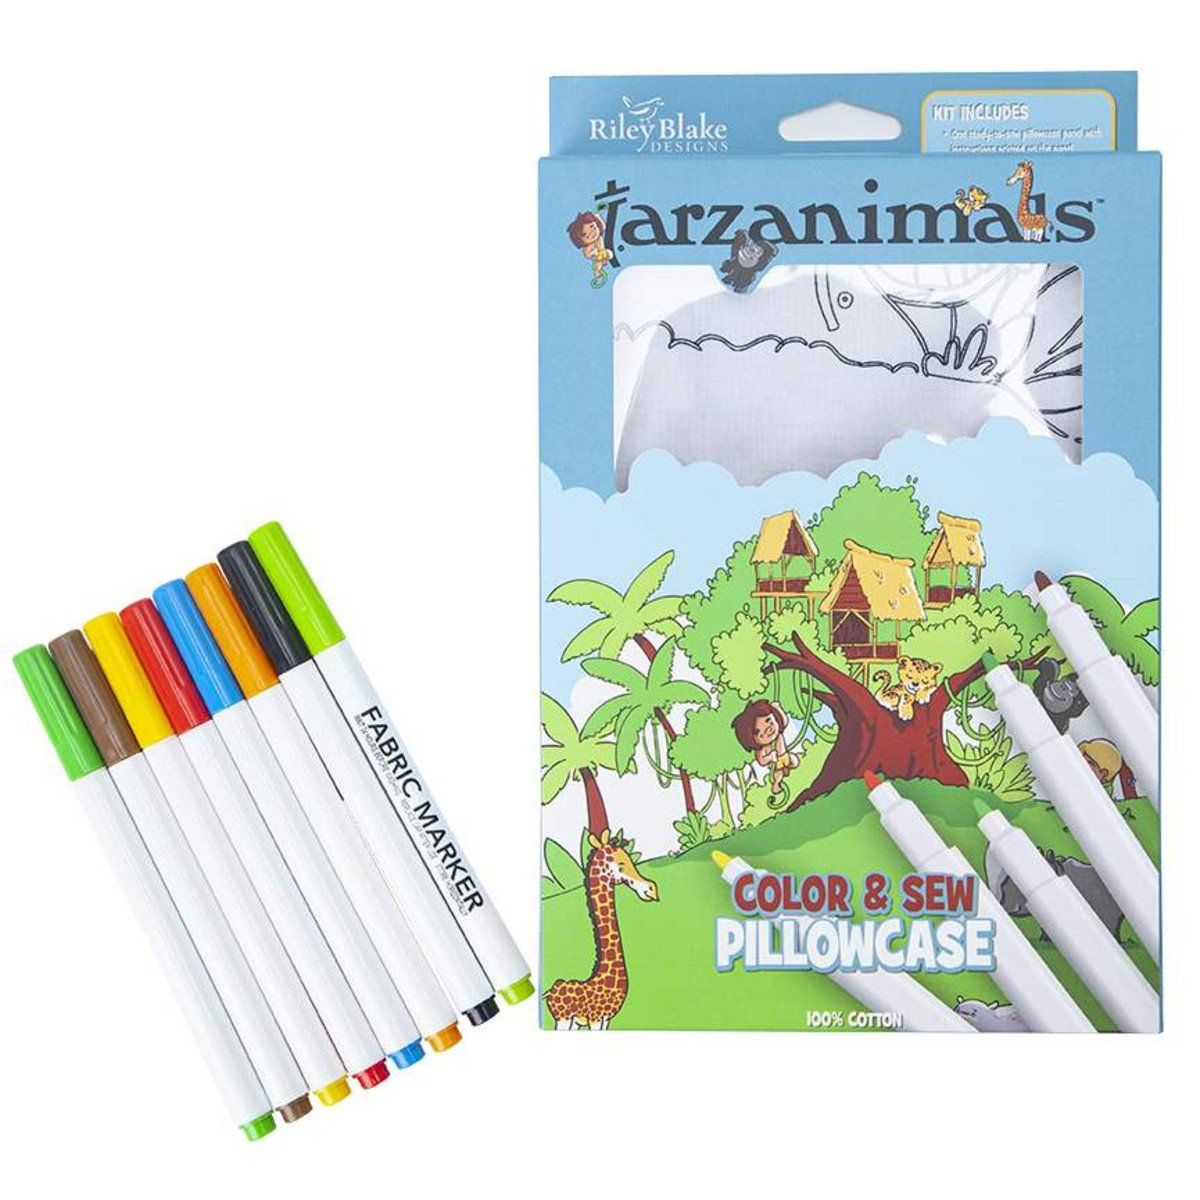 Color Me Pillowcase Kit Tarzanimals